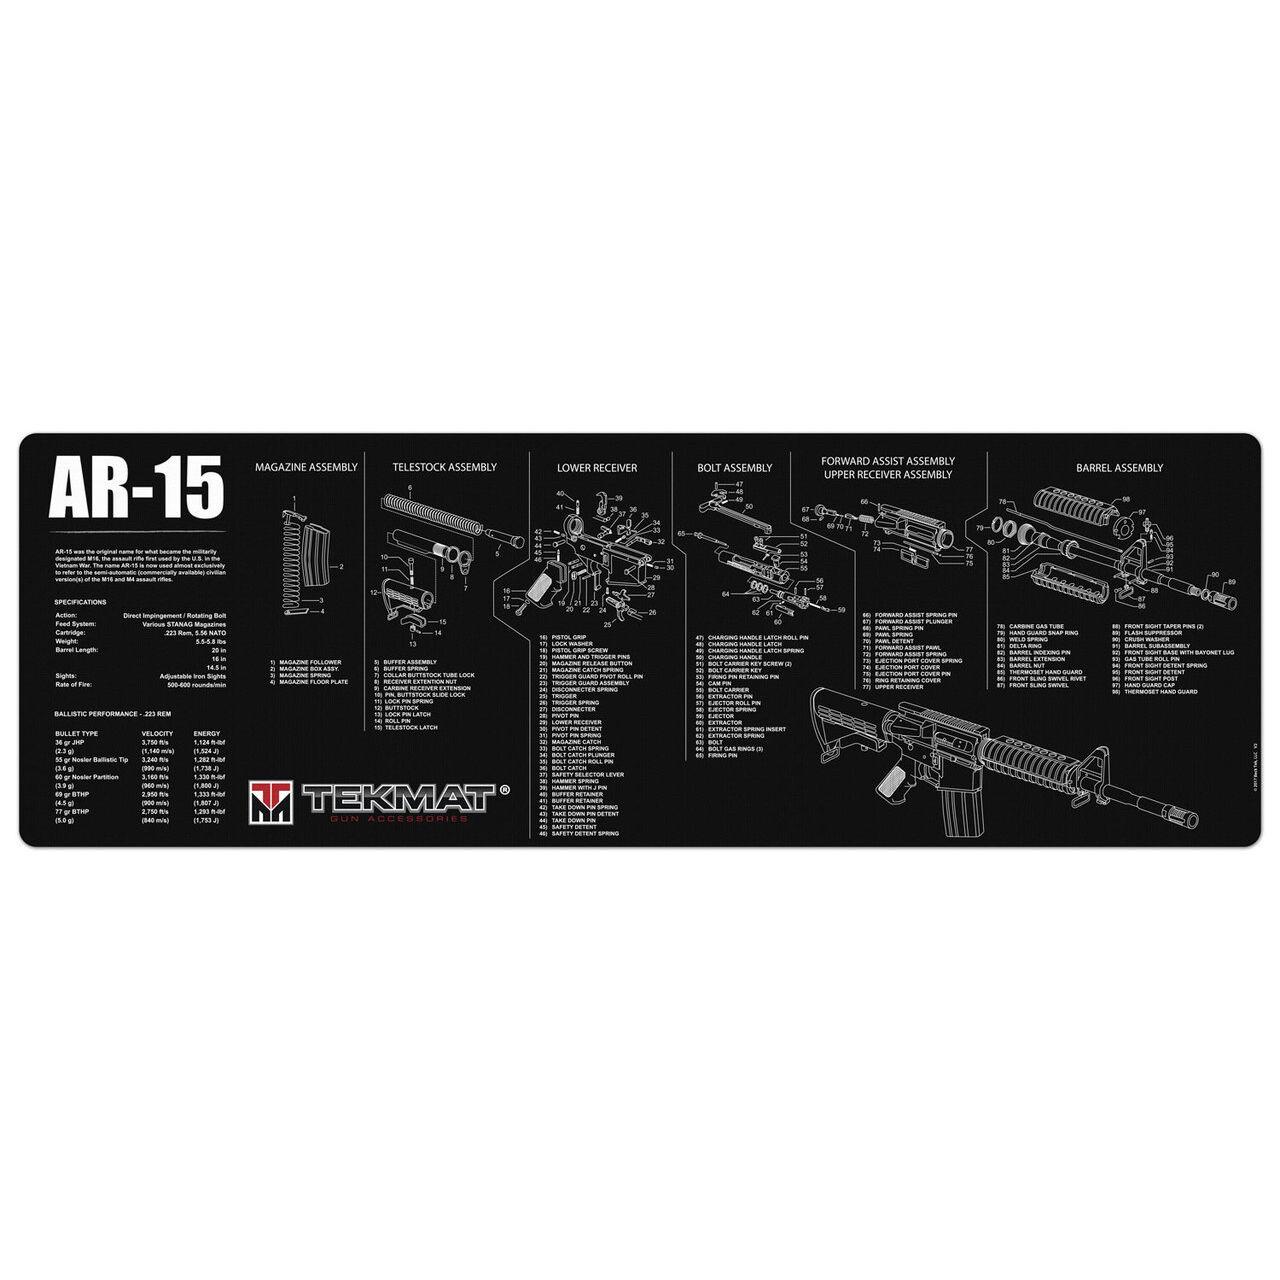 medium resolution of tekmat gun accessories armorer s bench tekmat ar 15 schematic mat ar 15 diagram 3 major components ar 15 diagram mat